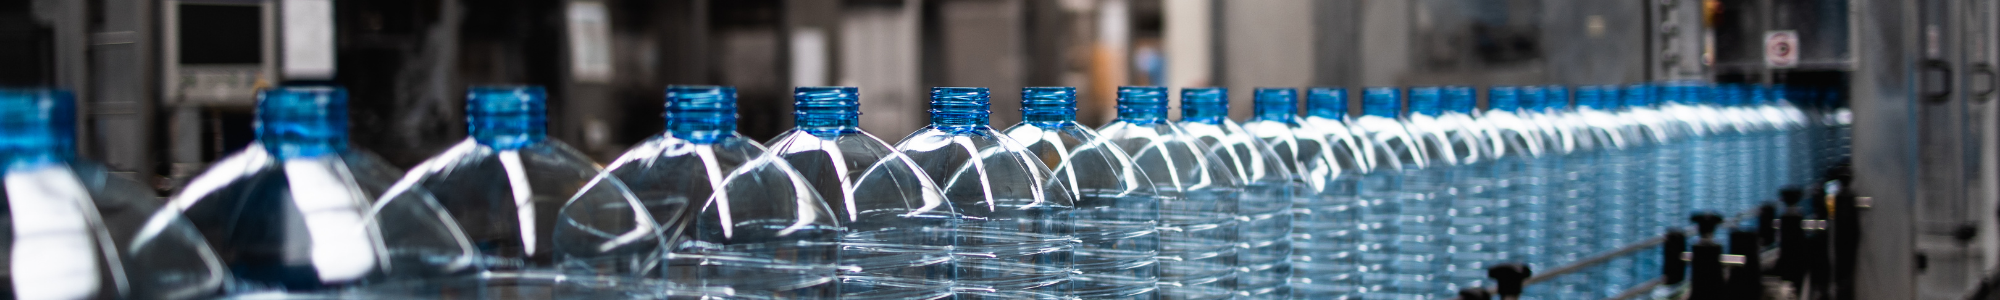 plastic bottle manufacturing